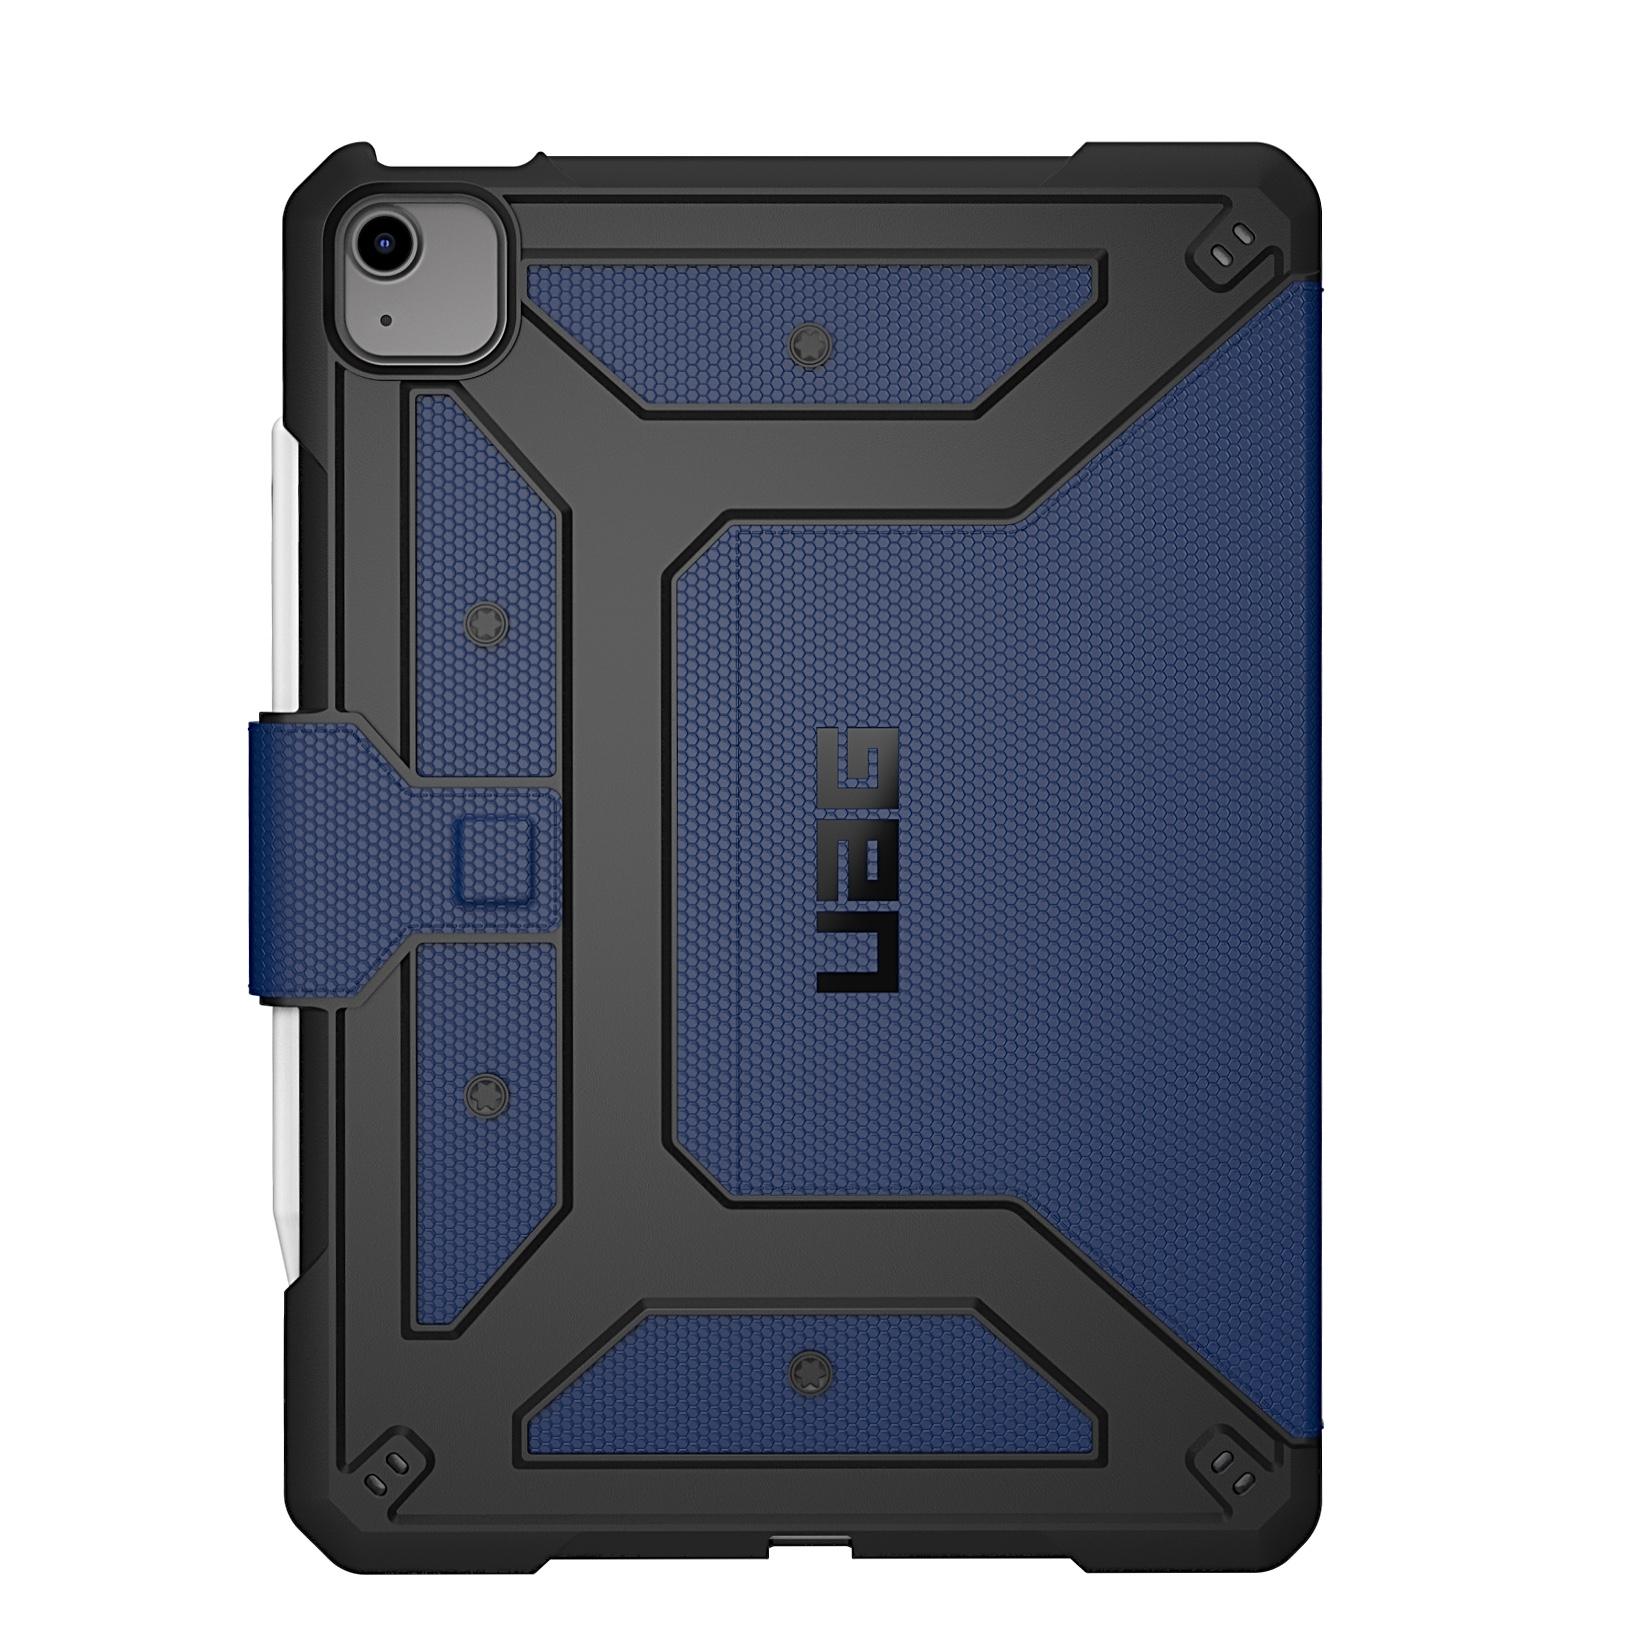 Apple Etui Folio de protection renforce Armure iPAD AIR 4 10.9 pouces